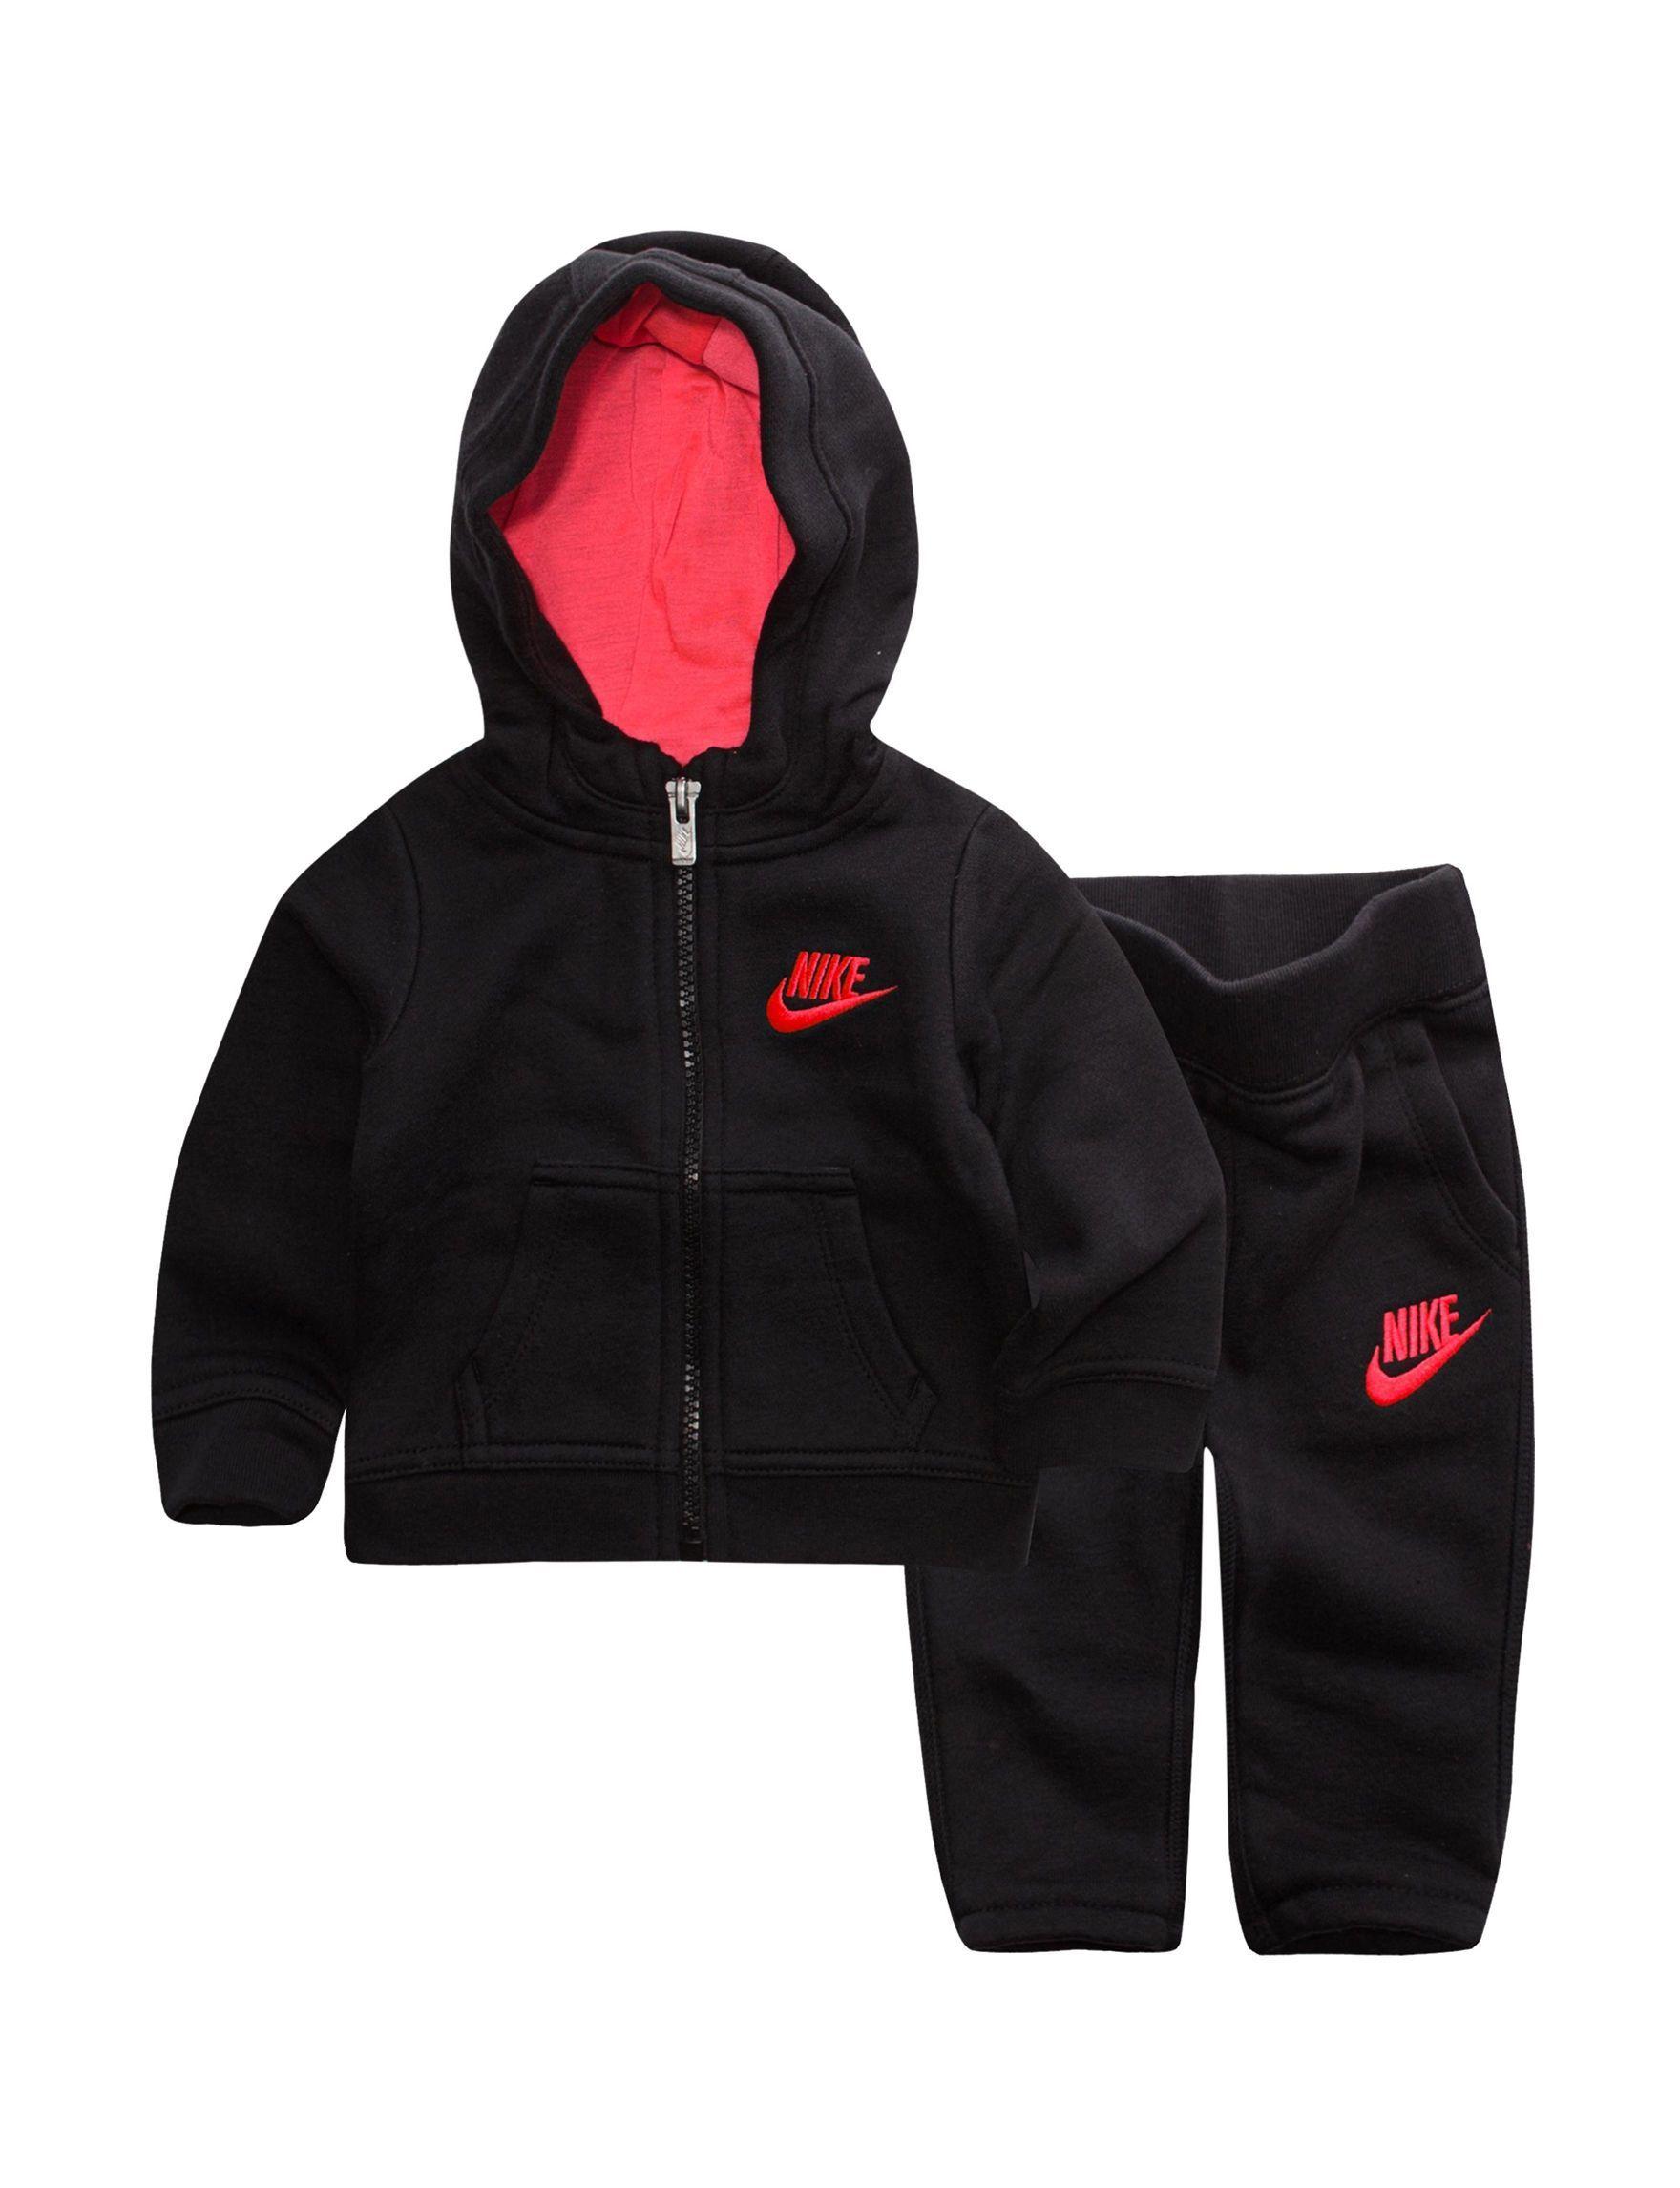 4848f5b4f840 Nike 2-pc. Futura Fleece Hoodie   Pants Set - Baby 12-24 Mos ...